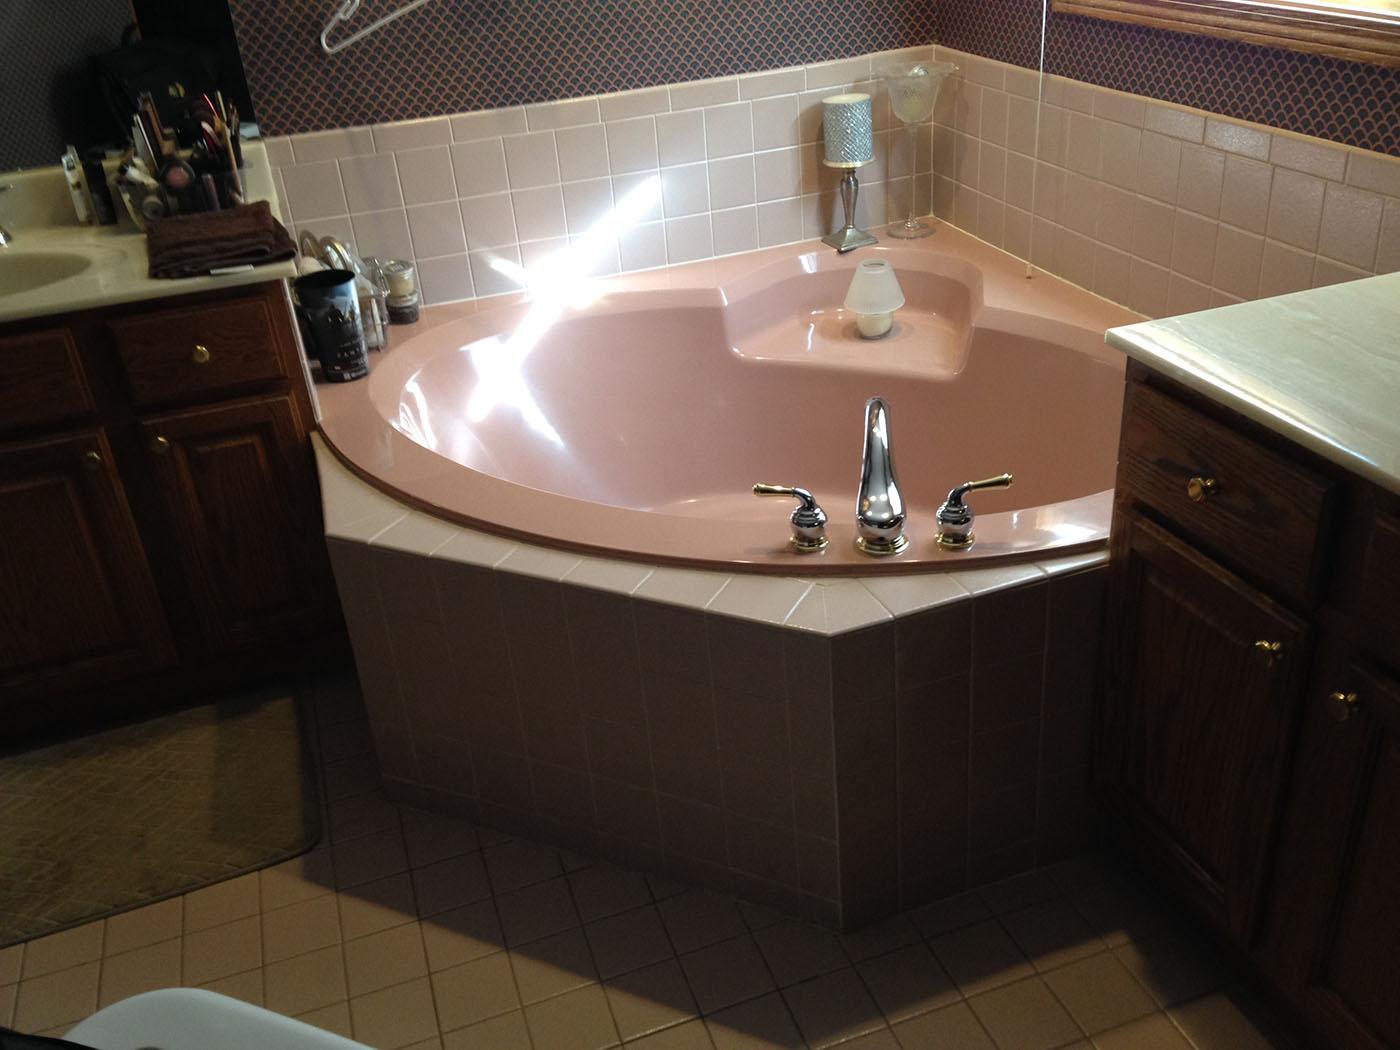 Julie-A-Green-Oaks-Bathroom-before-2